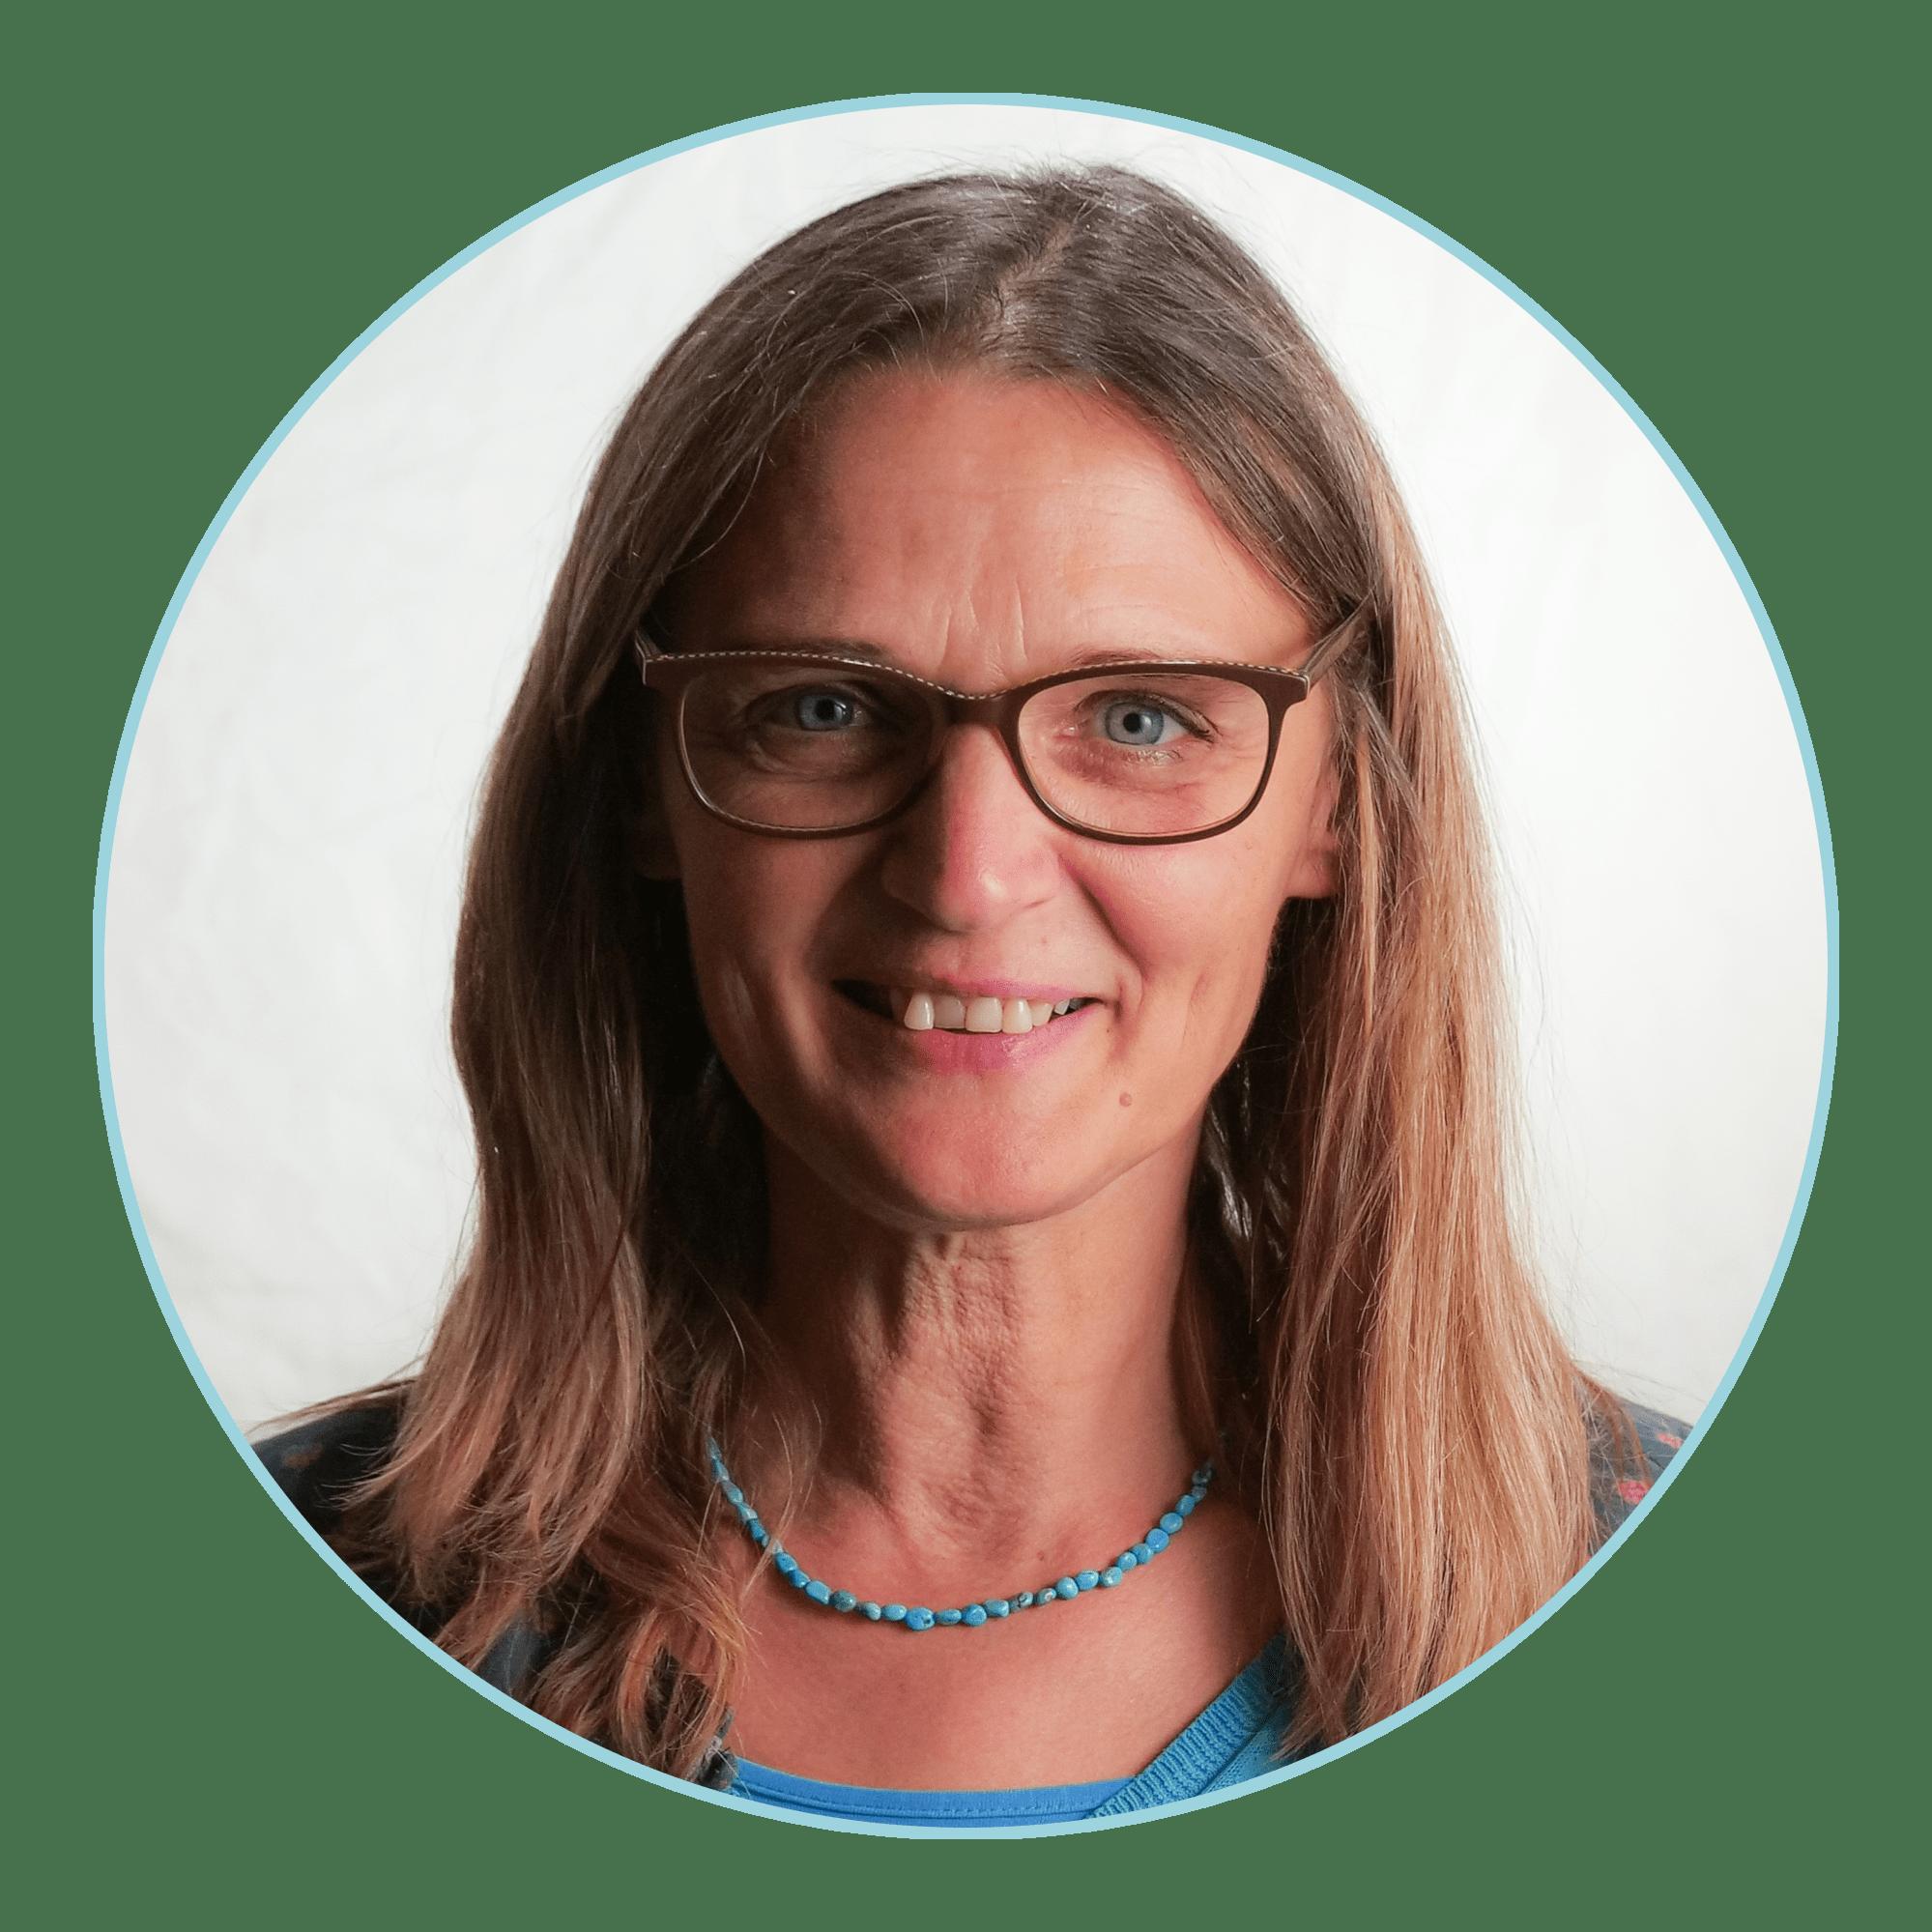 Christine Weiss